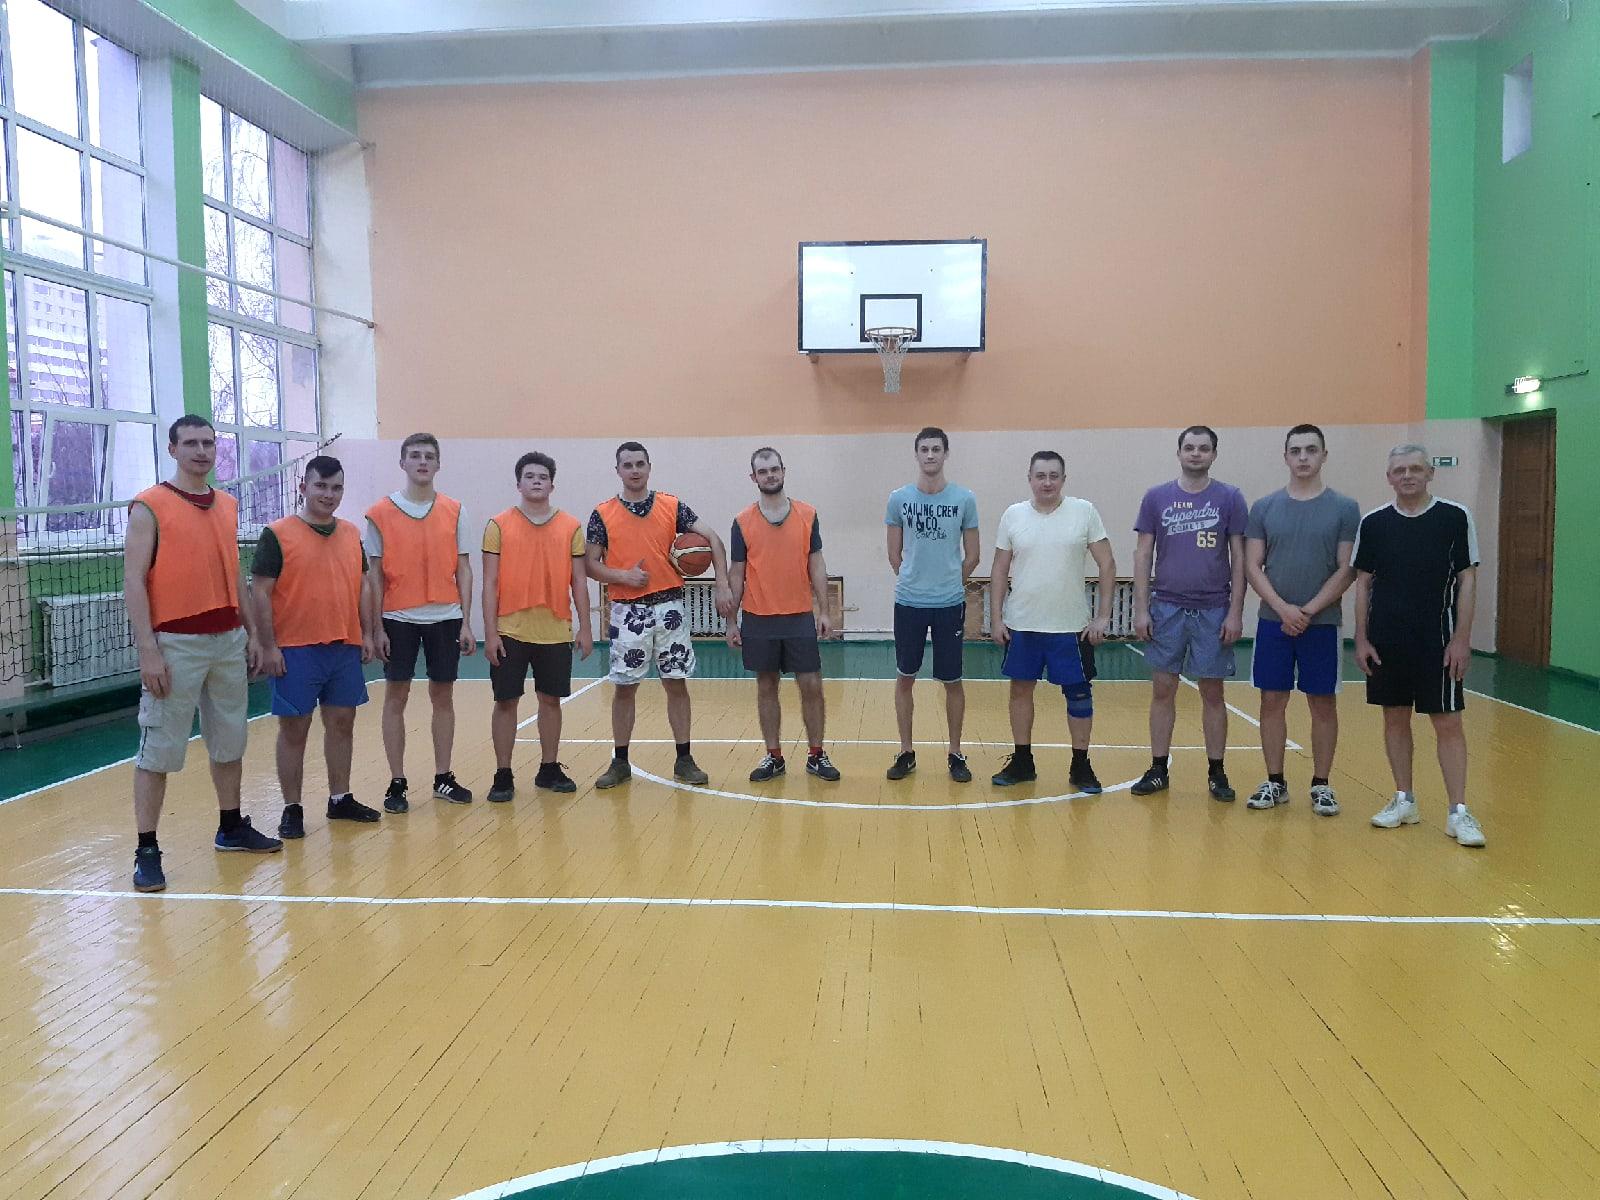 Рождественский товарищеский турнир по баскетболу среди команд преподавателей